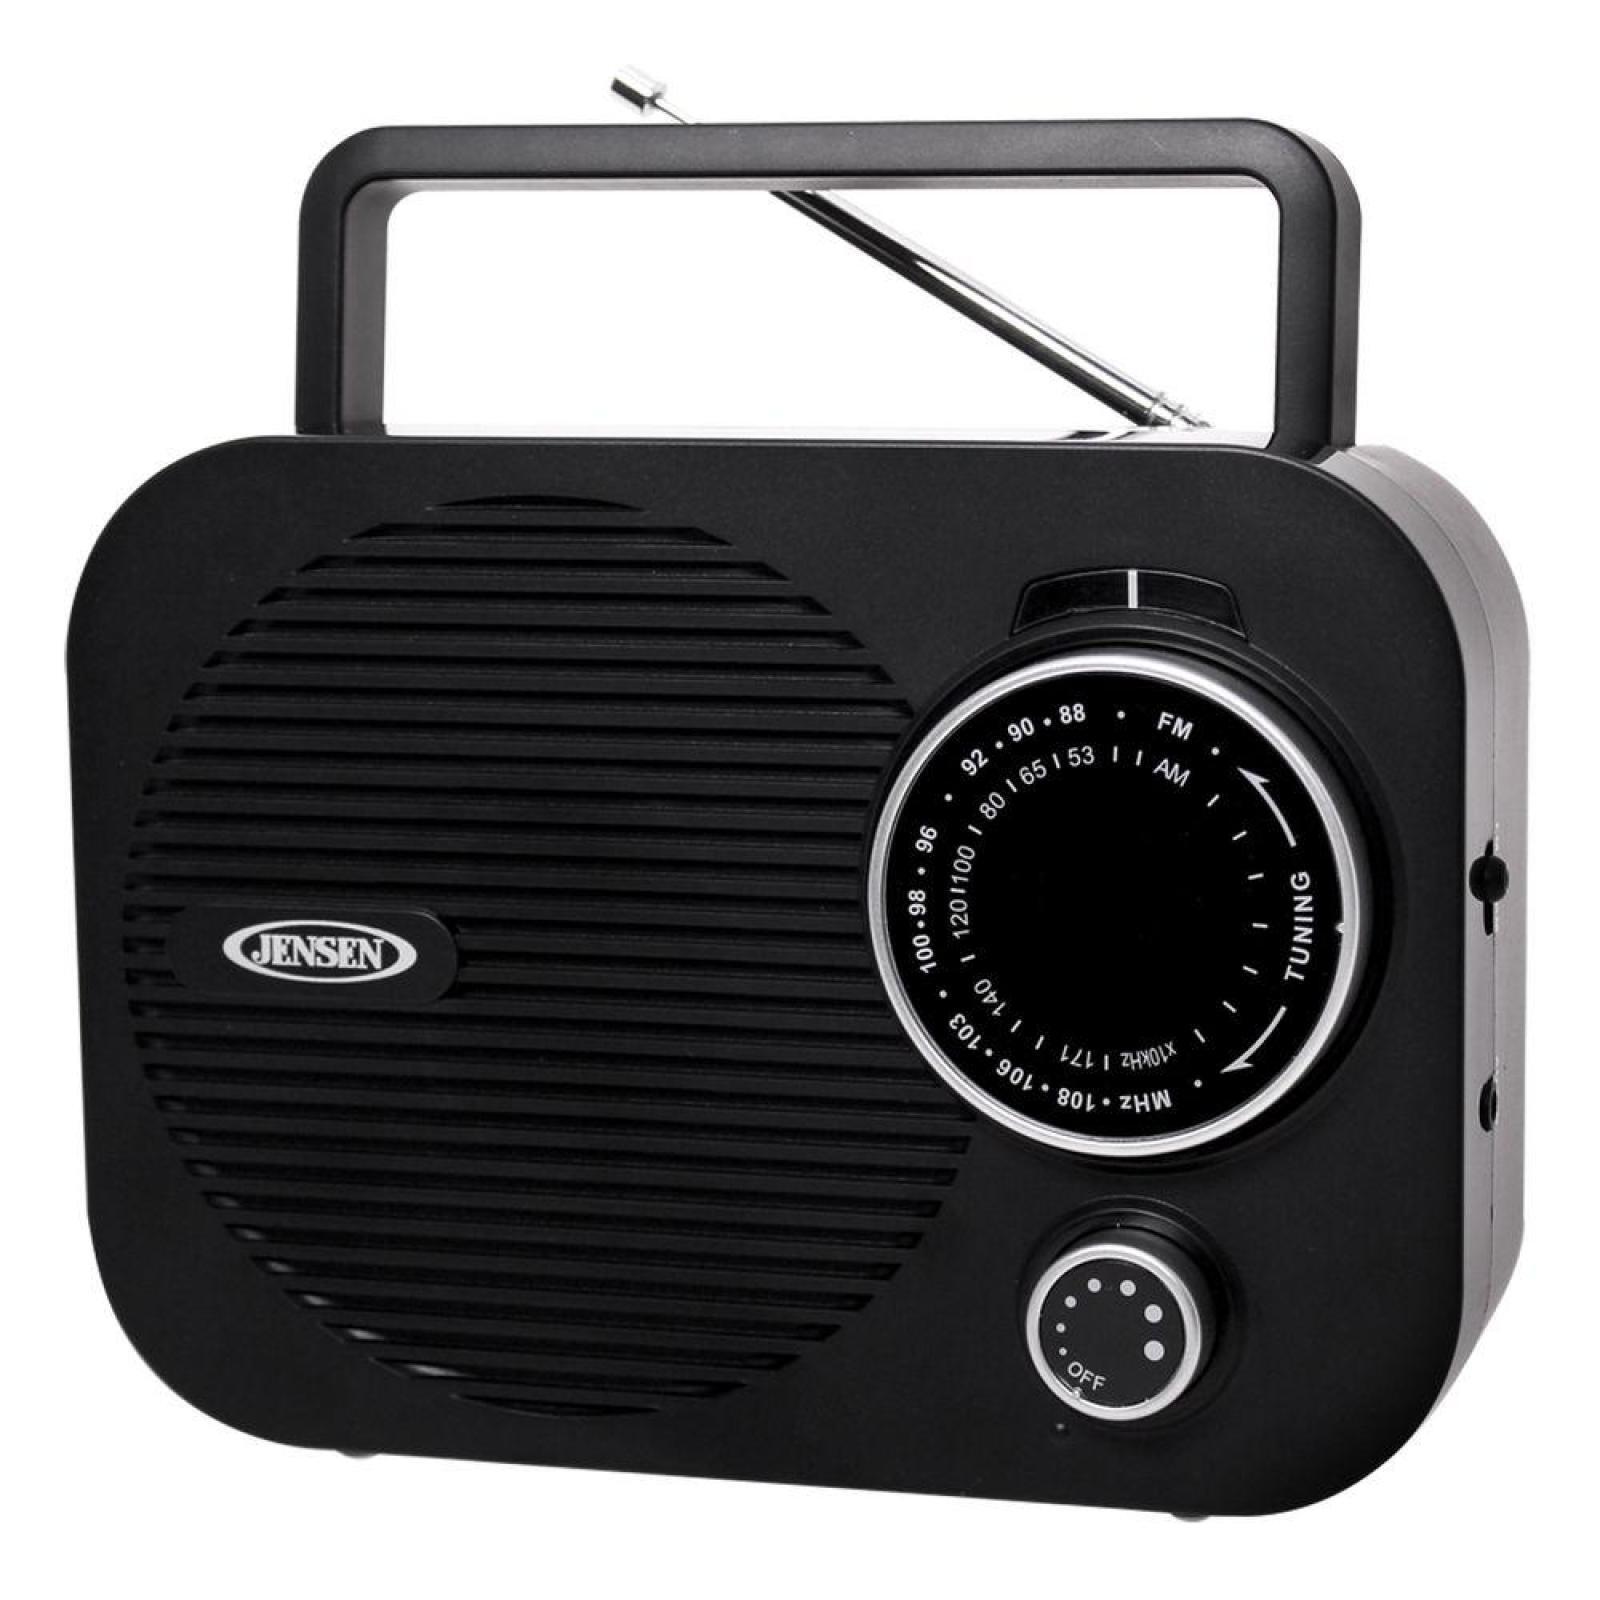 JENSEN Portable AM/FM Radio Classic Vintage iPod MP3 Digital